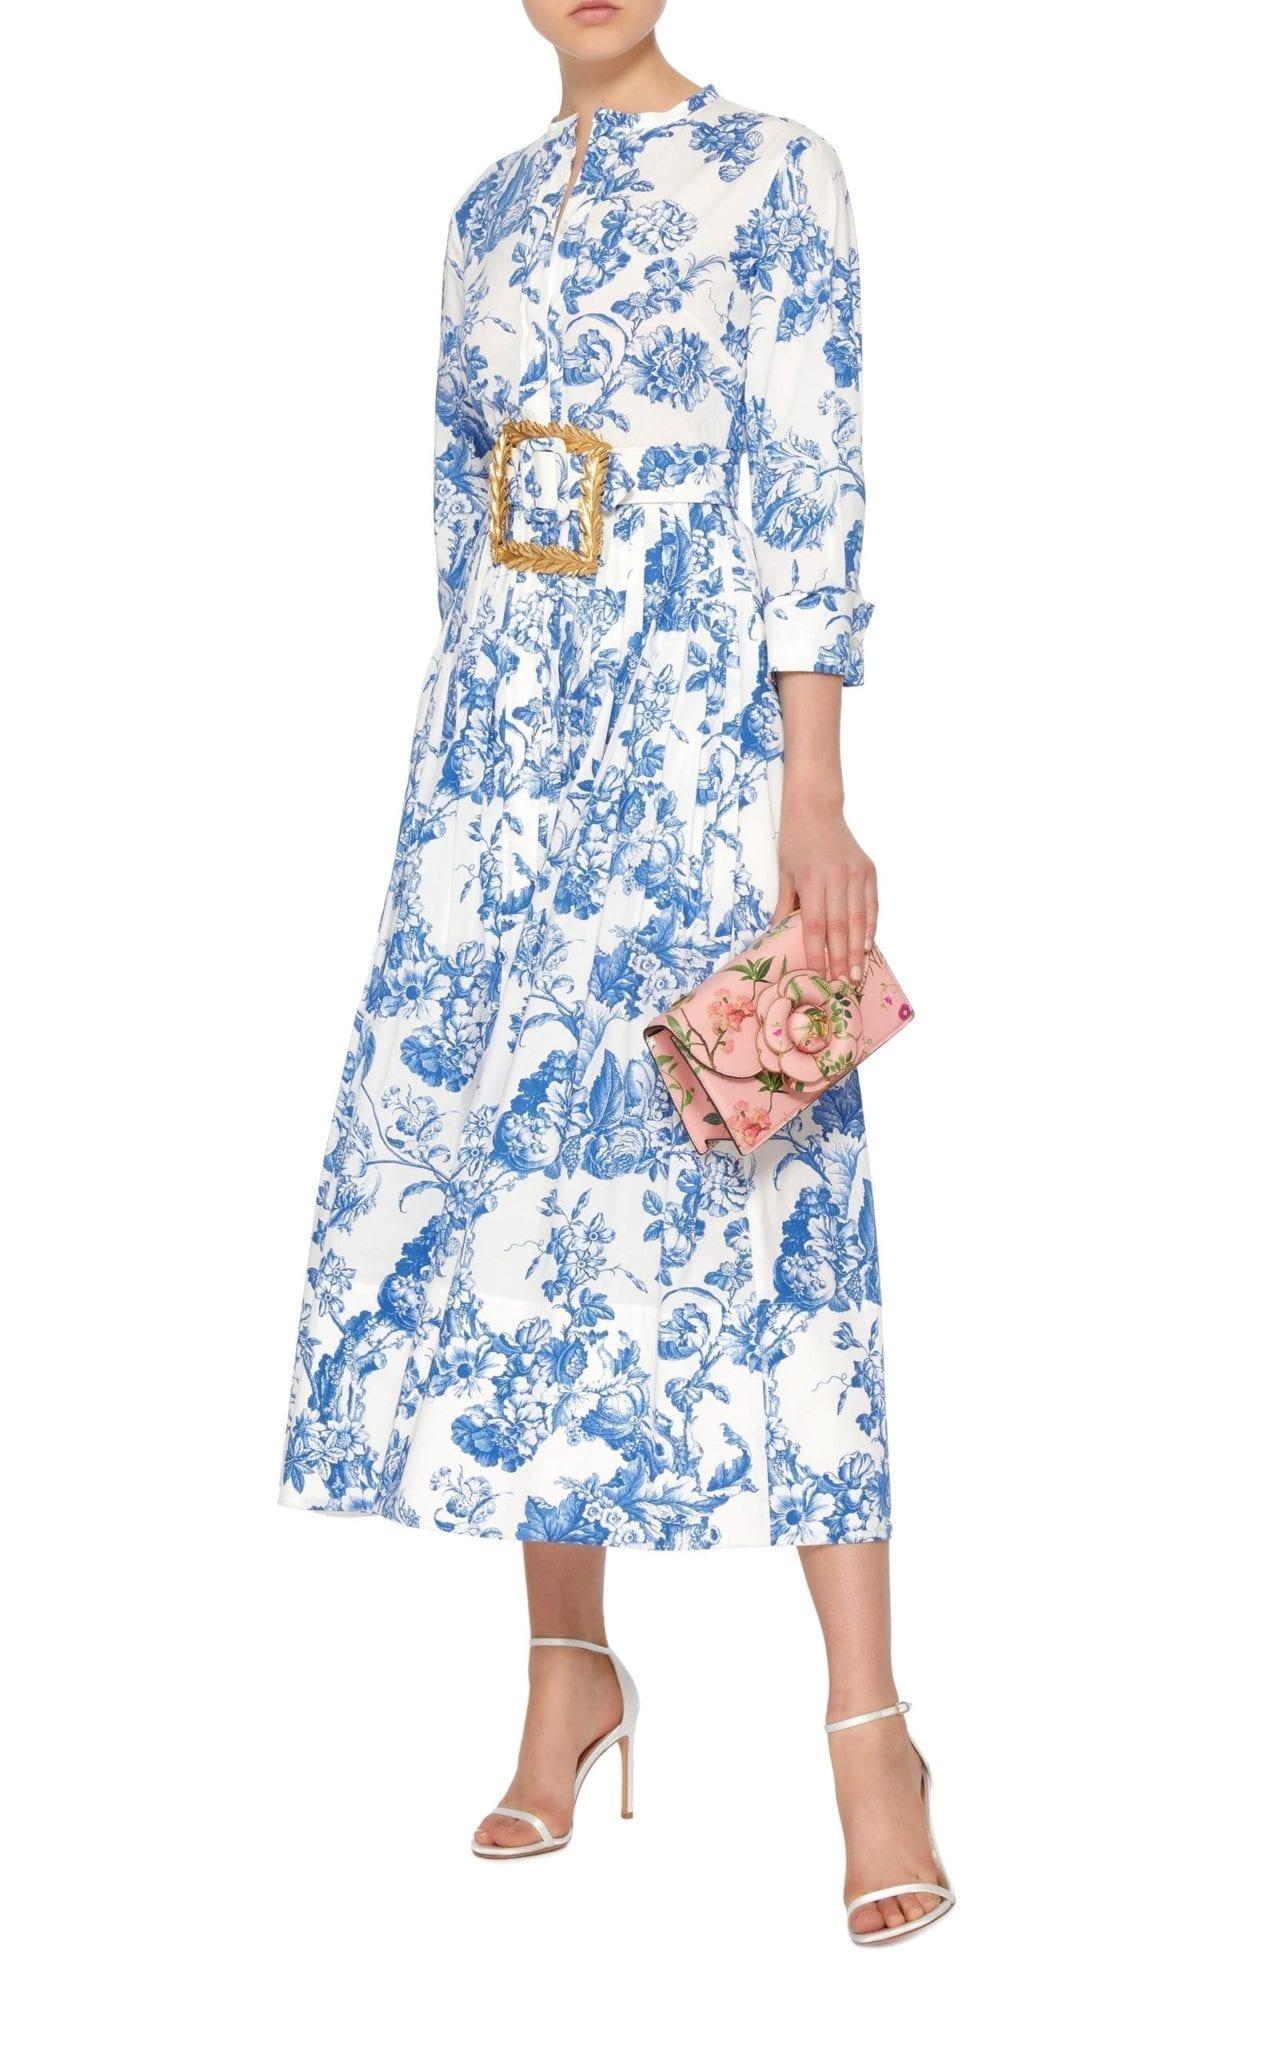 OSCAR DE LA RENTA Belted Floral-Print Stretch-Cotton Dress